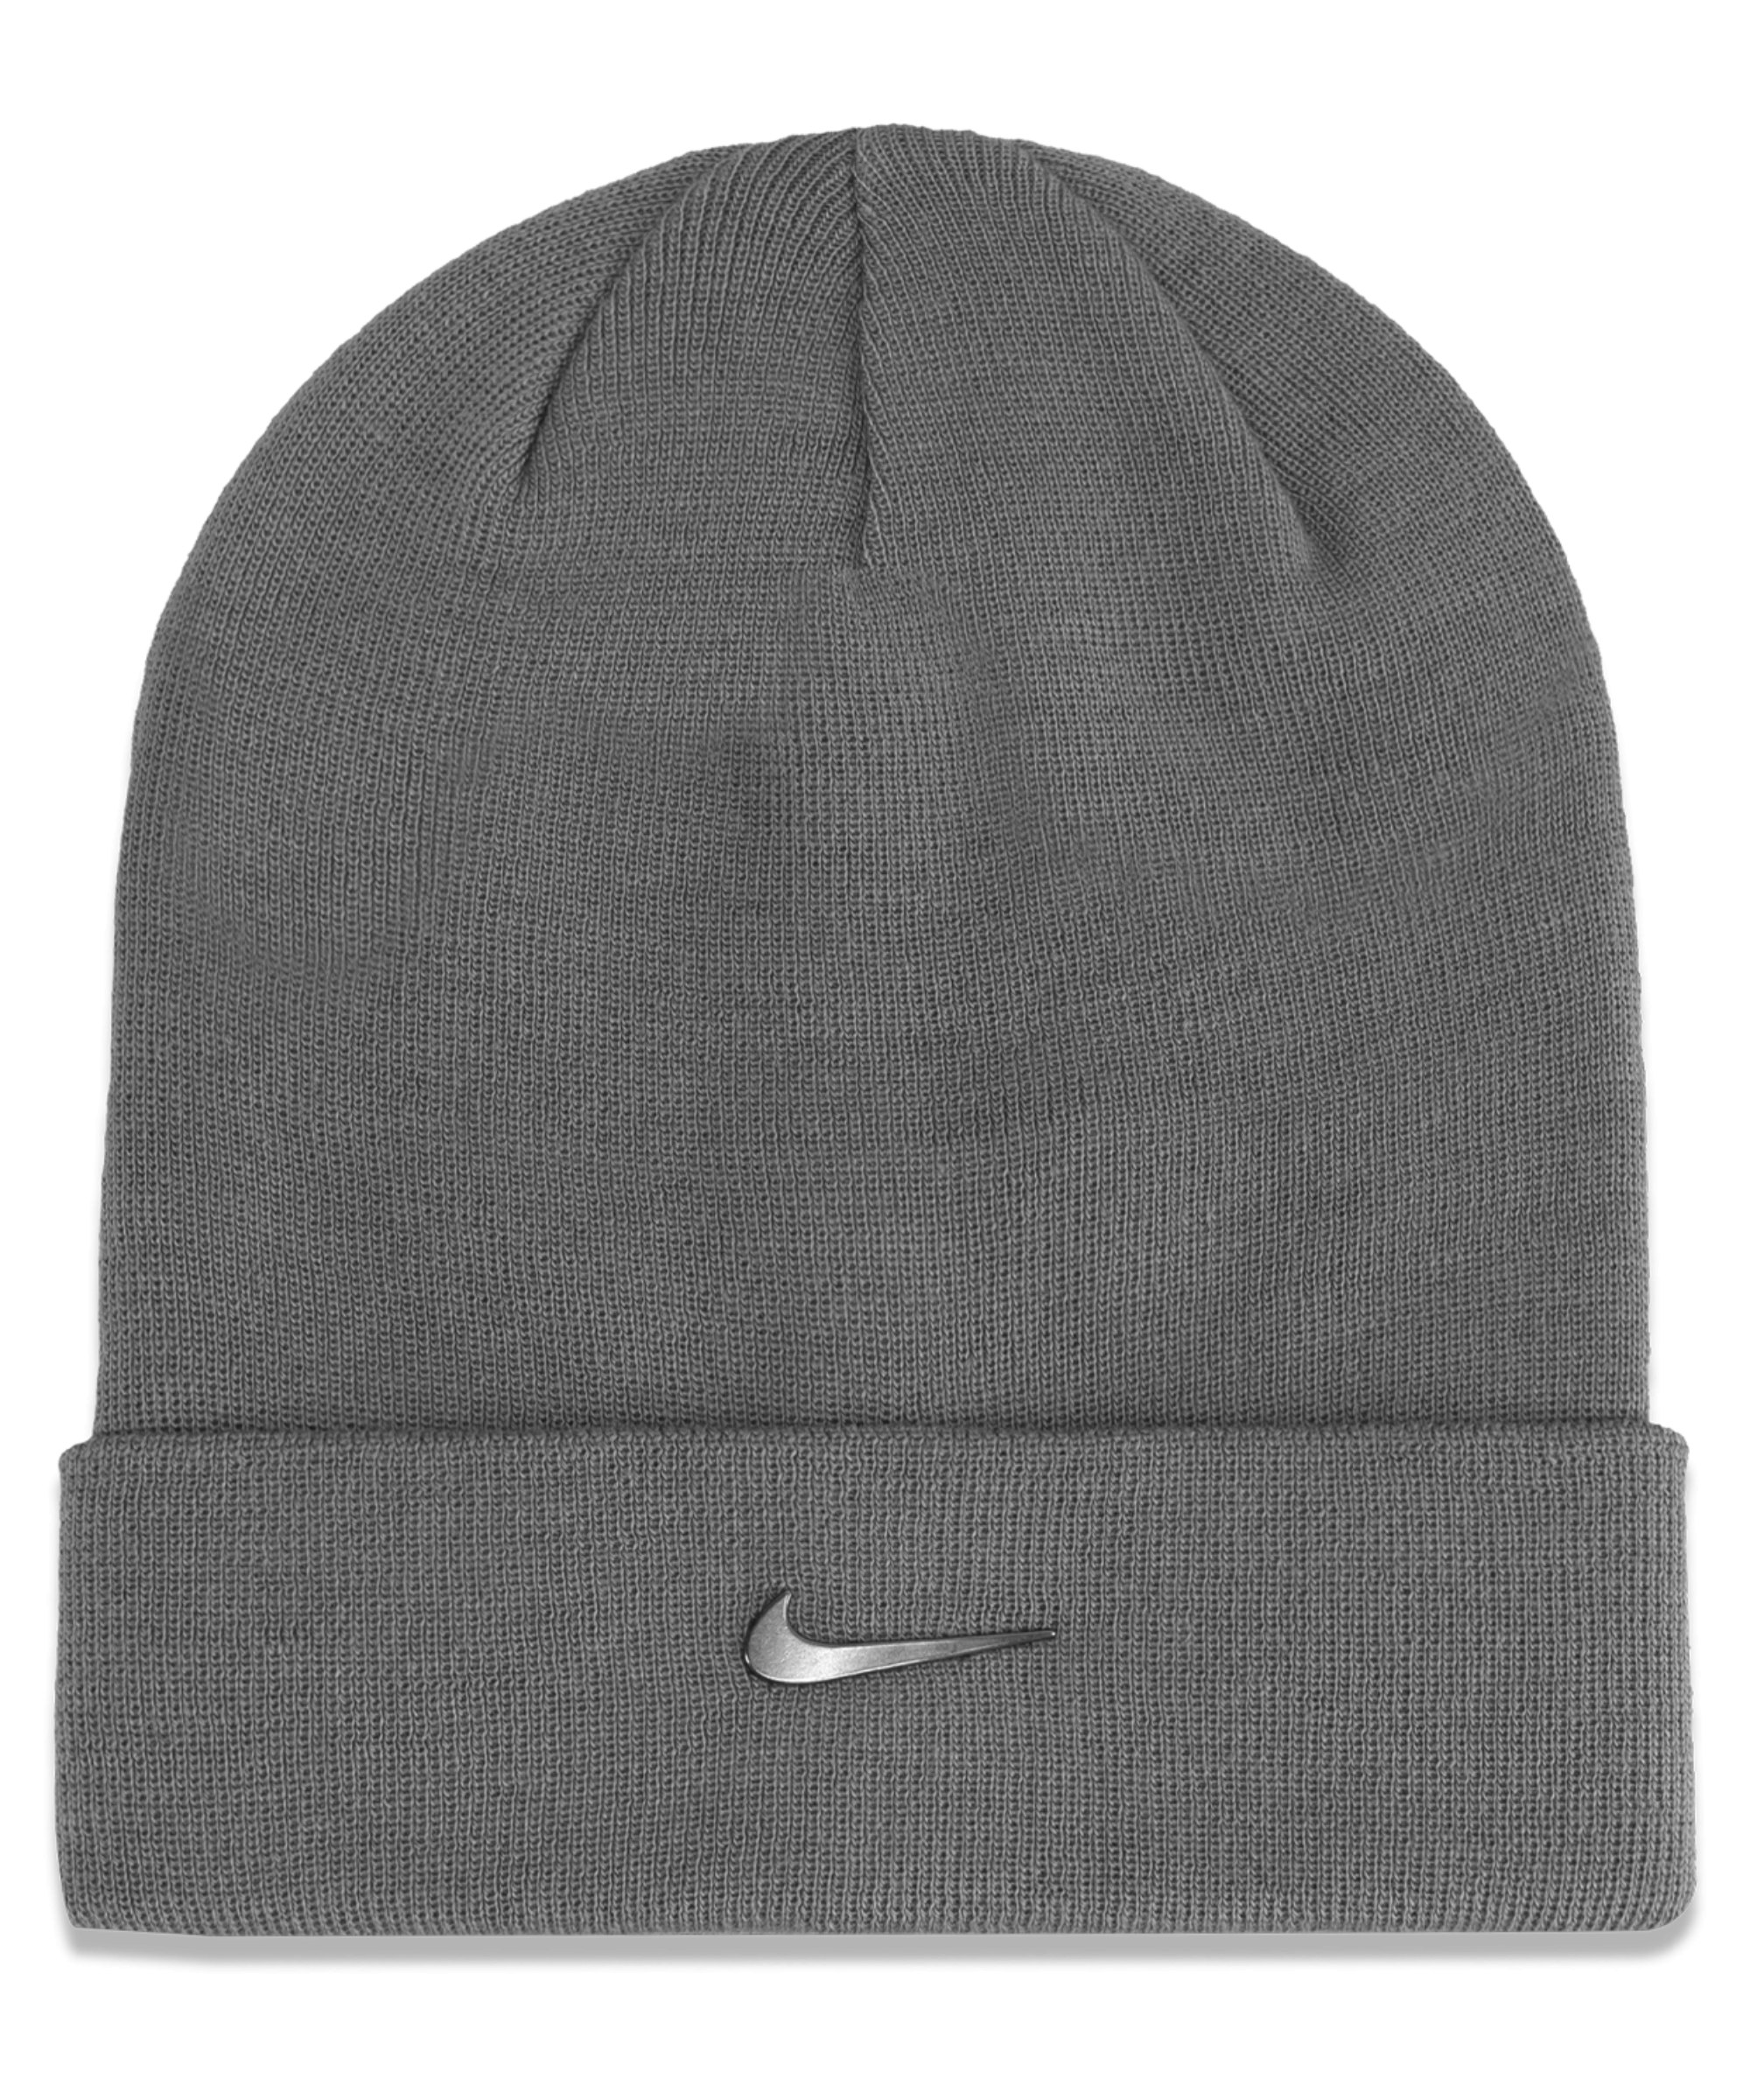 Nike Mütze Kids Grau F084 - grau